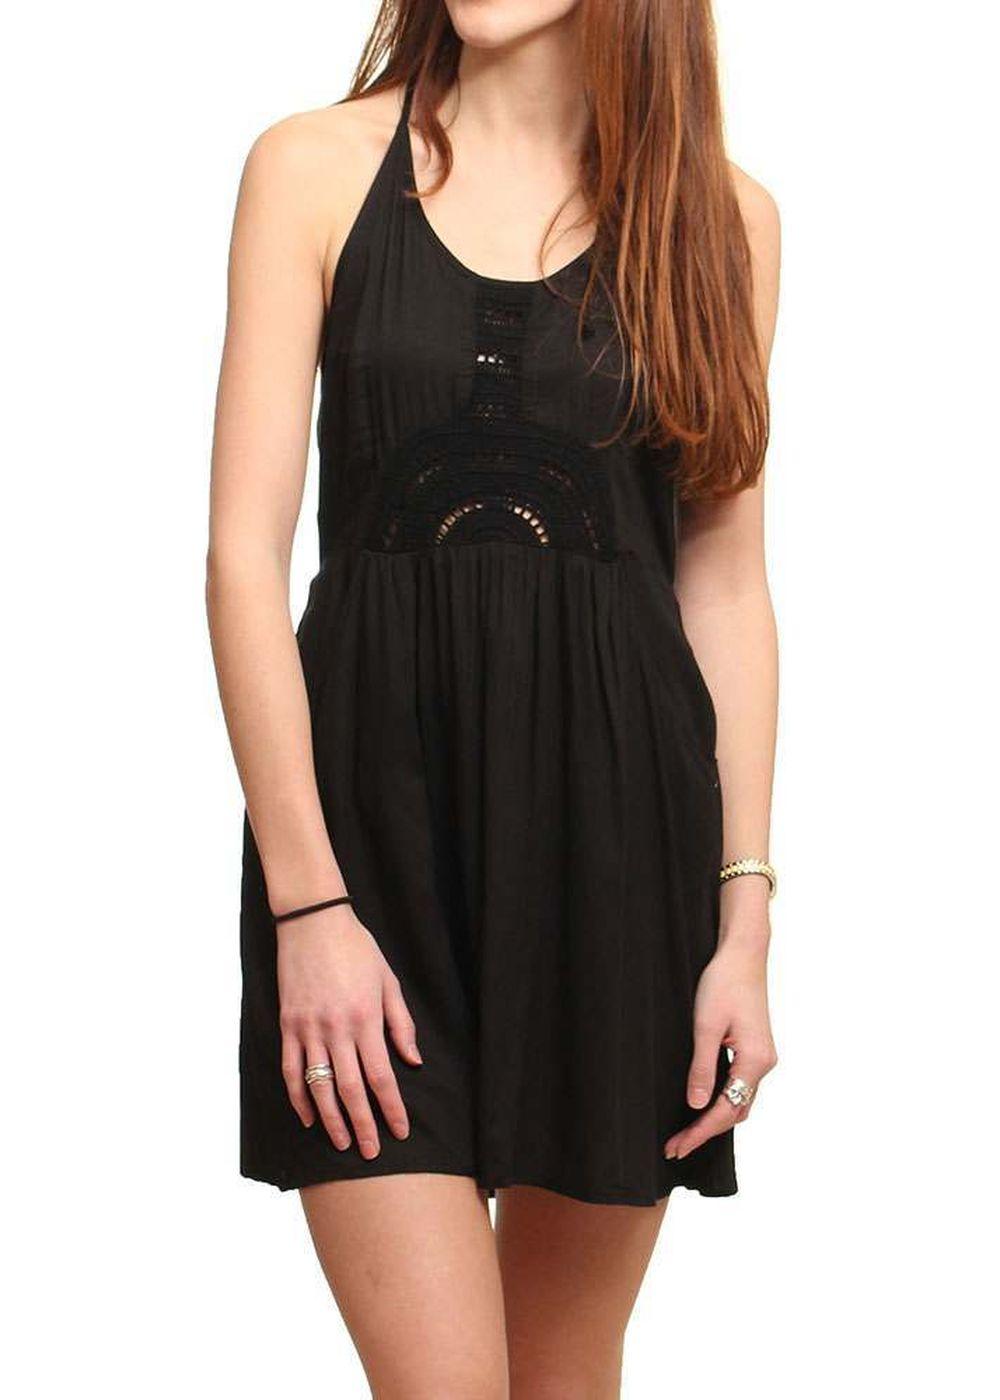 roxy-dance-to-the-beat-dress-true-black